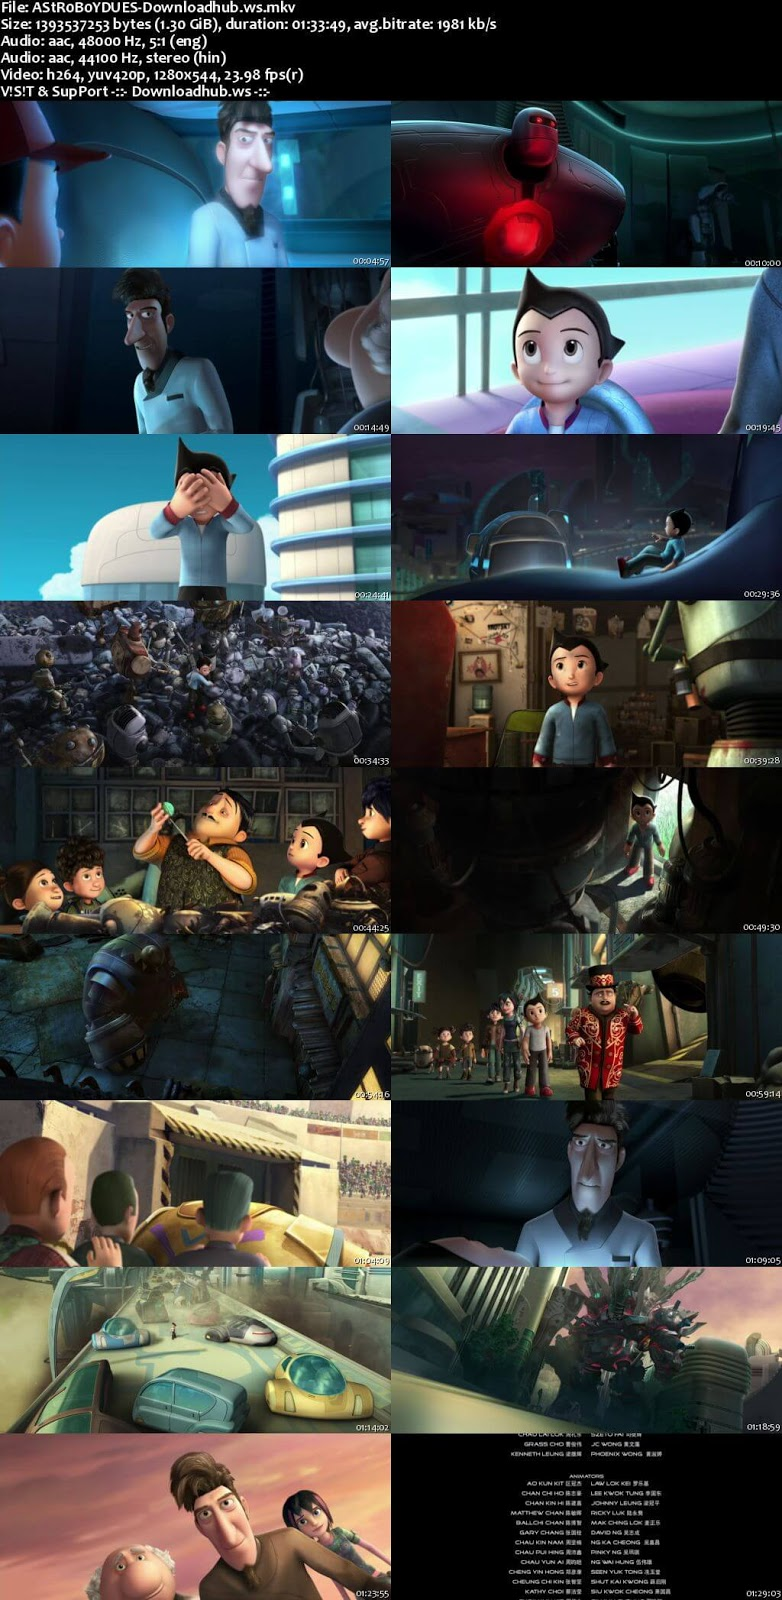 Astro Boy 2009 Hindi Dual Audio 720p BluRay Free Download